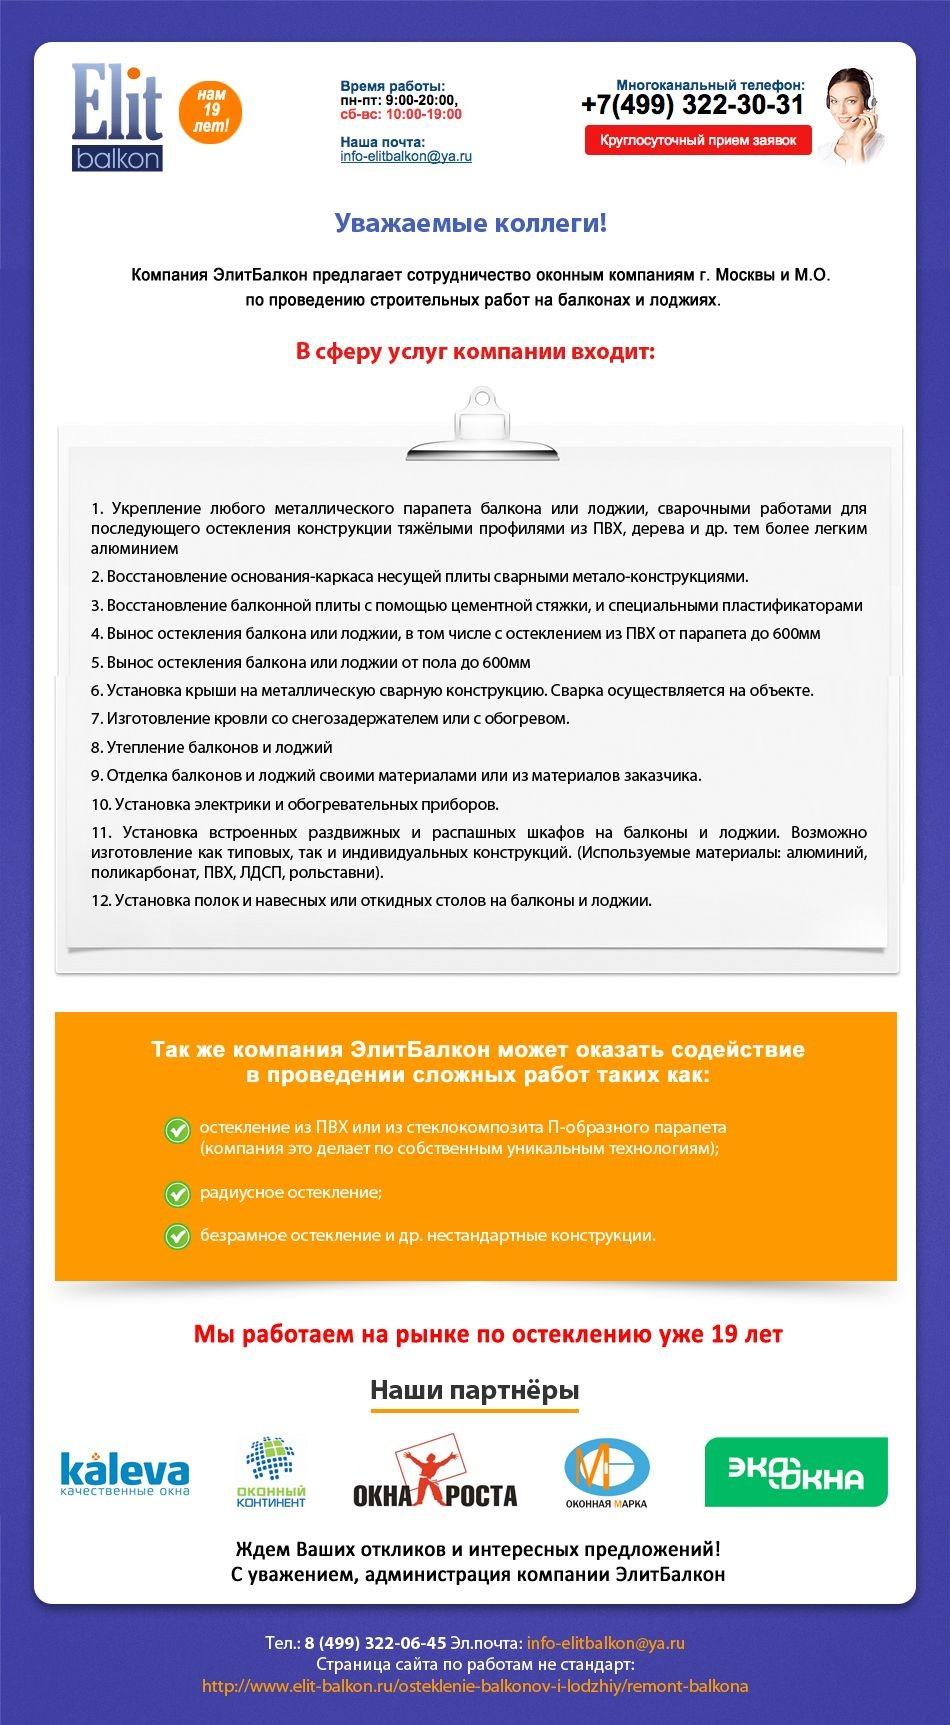 Elit balkon rassilka 2019 - Партнерам